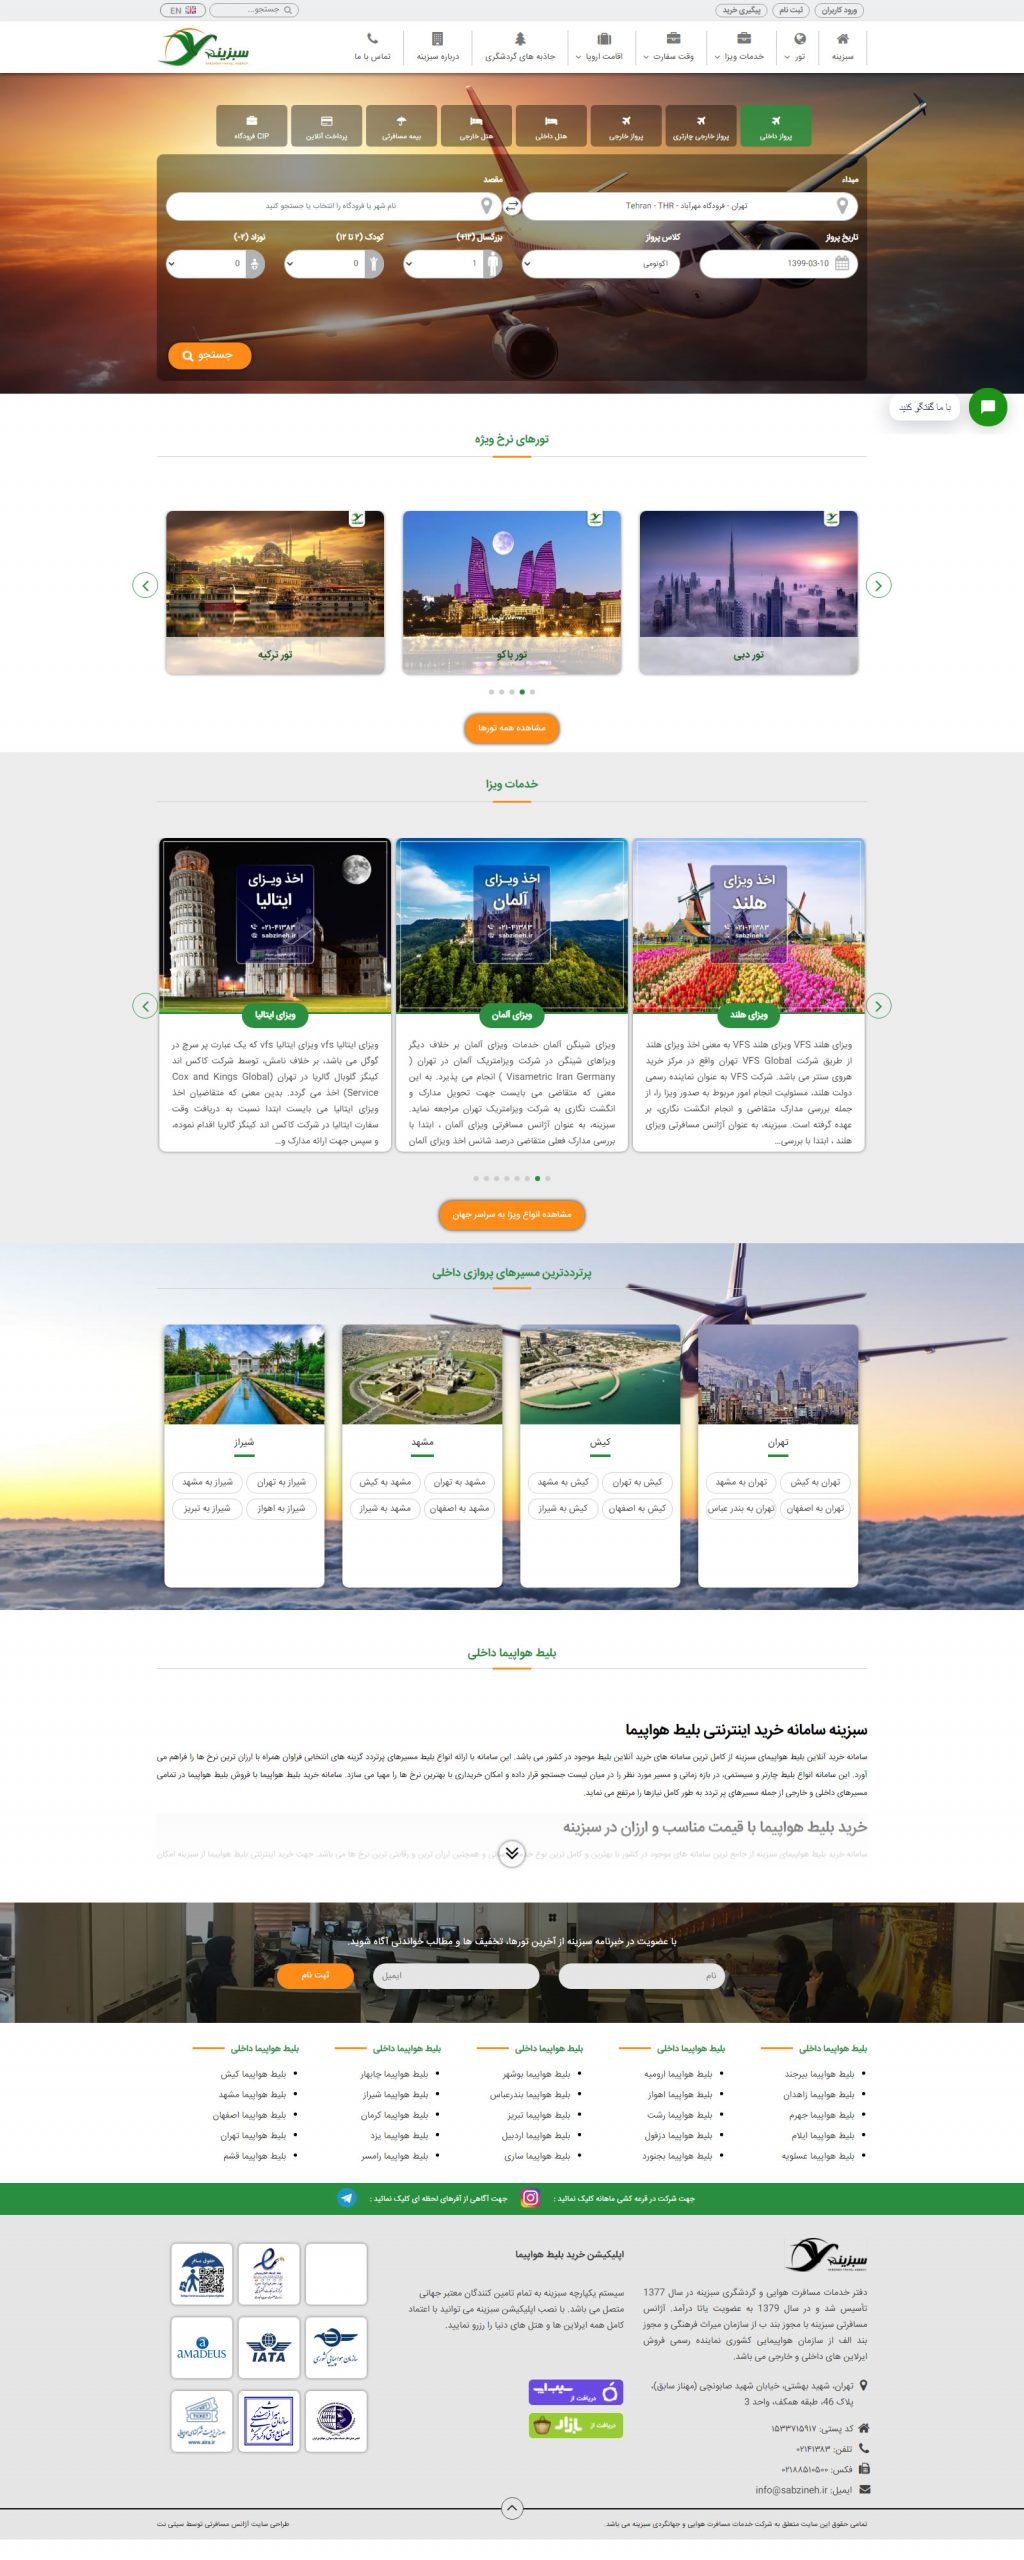 آژانس مسافرتی سبزینه